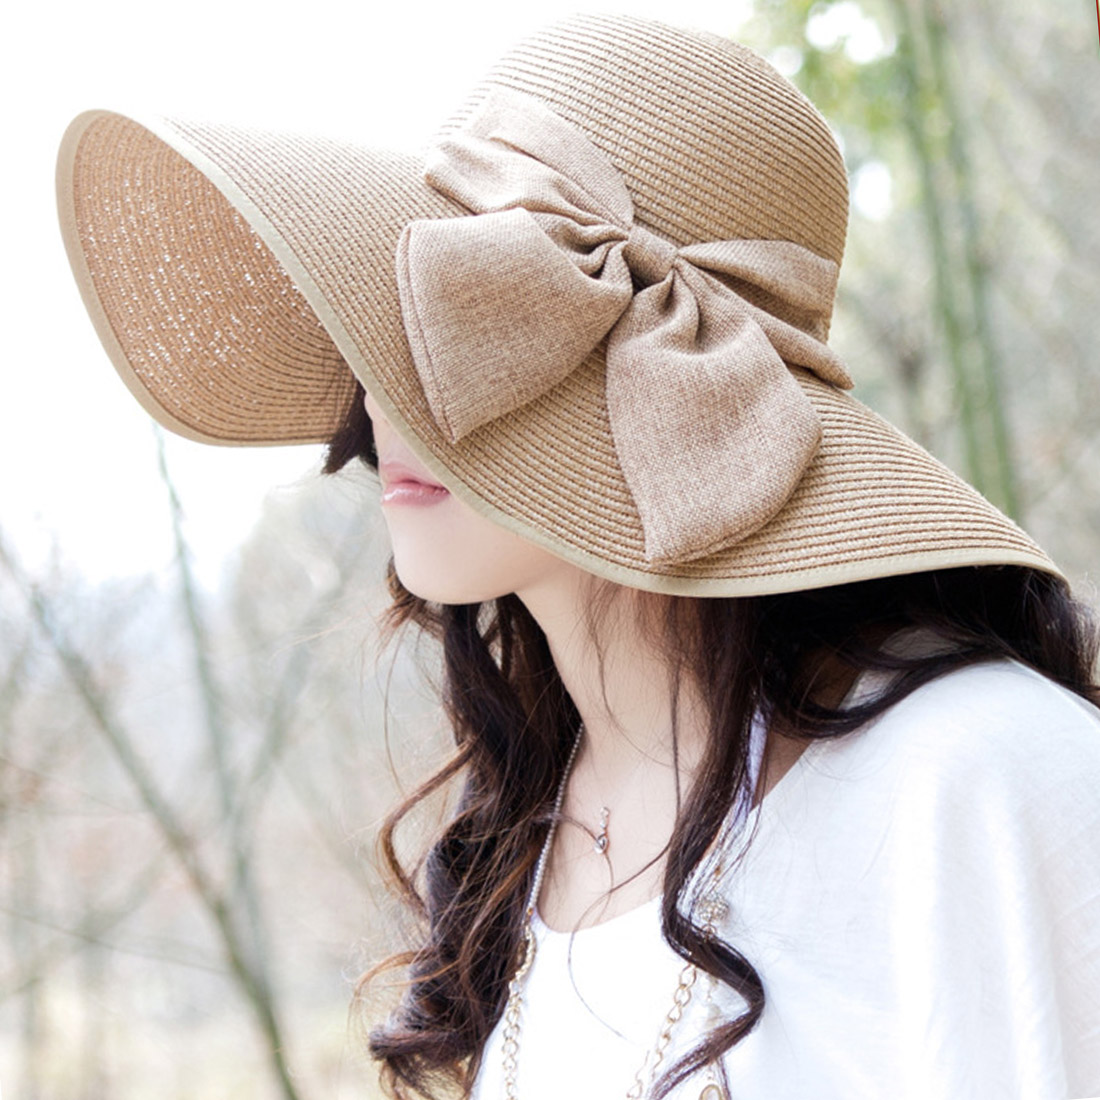 casquette enfant garcon 2019 Ladies Summer Large Brim Straw Hat Floppy Wide Brim Sun Cap Bowknot Beach Foldable New in Women 39 s Sun Hats from Apparel Accessories